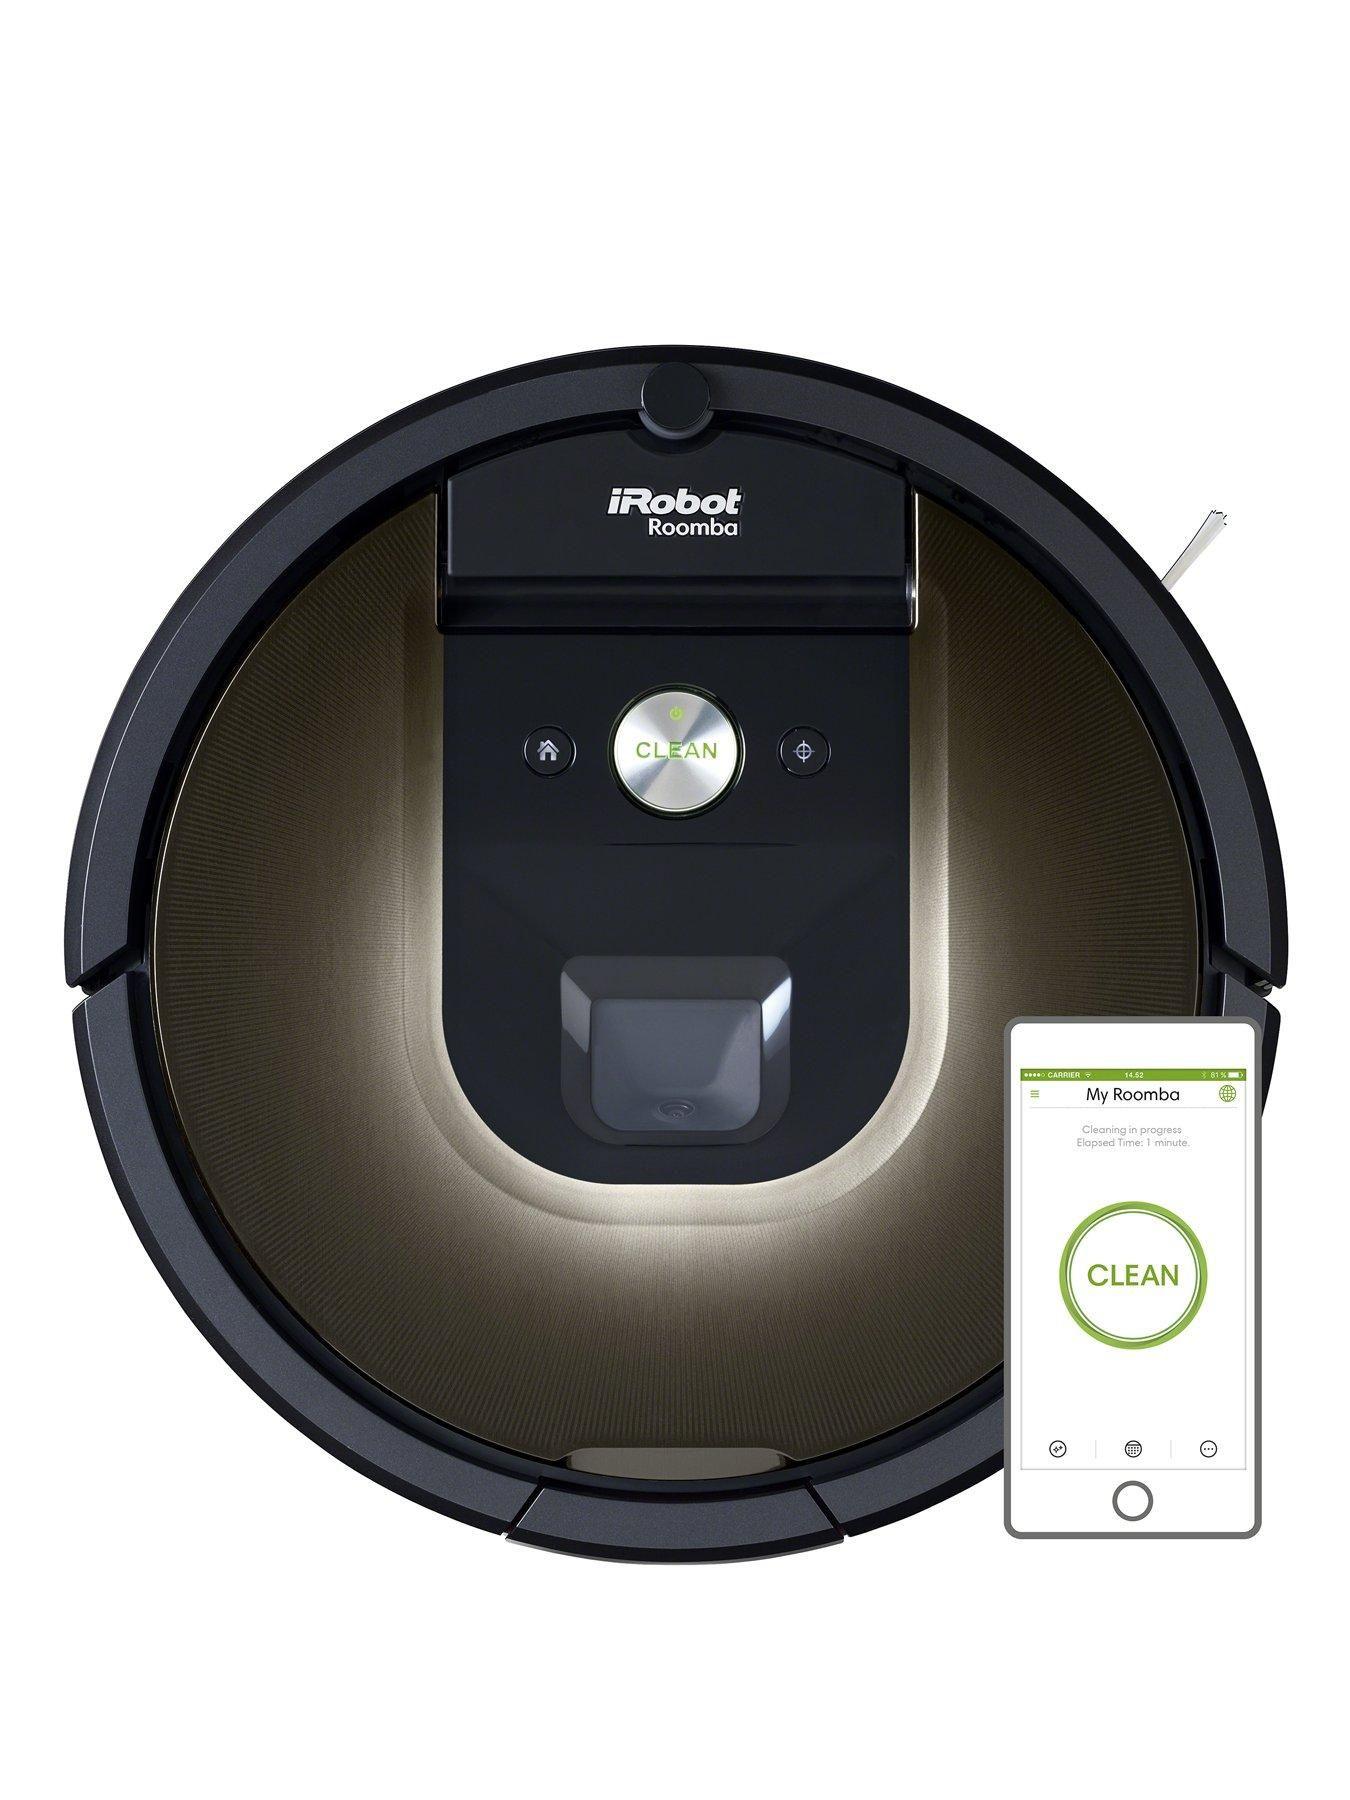 iRobot Roomba® 980 Robot Vacuum Cleaner Irobot, Irobot